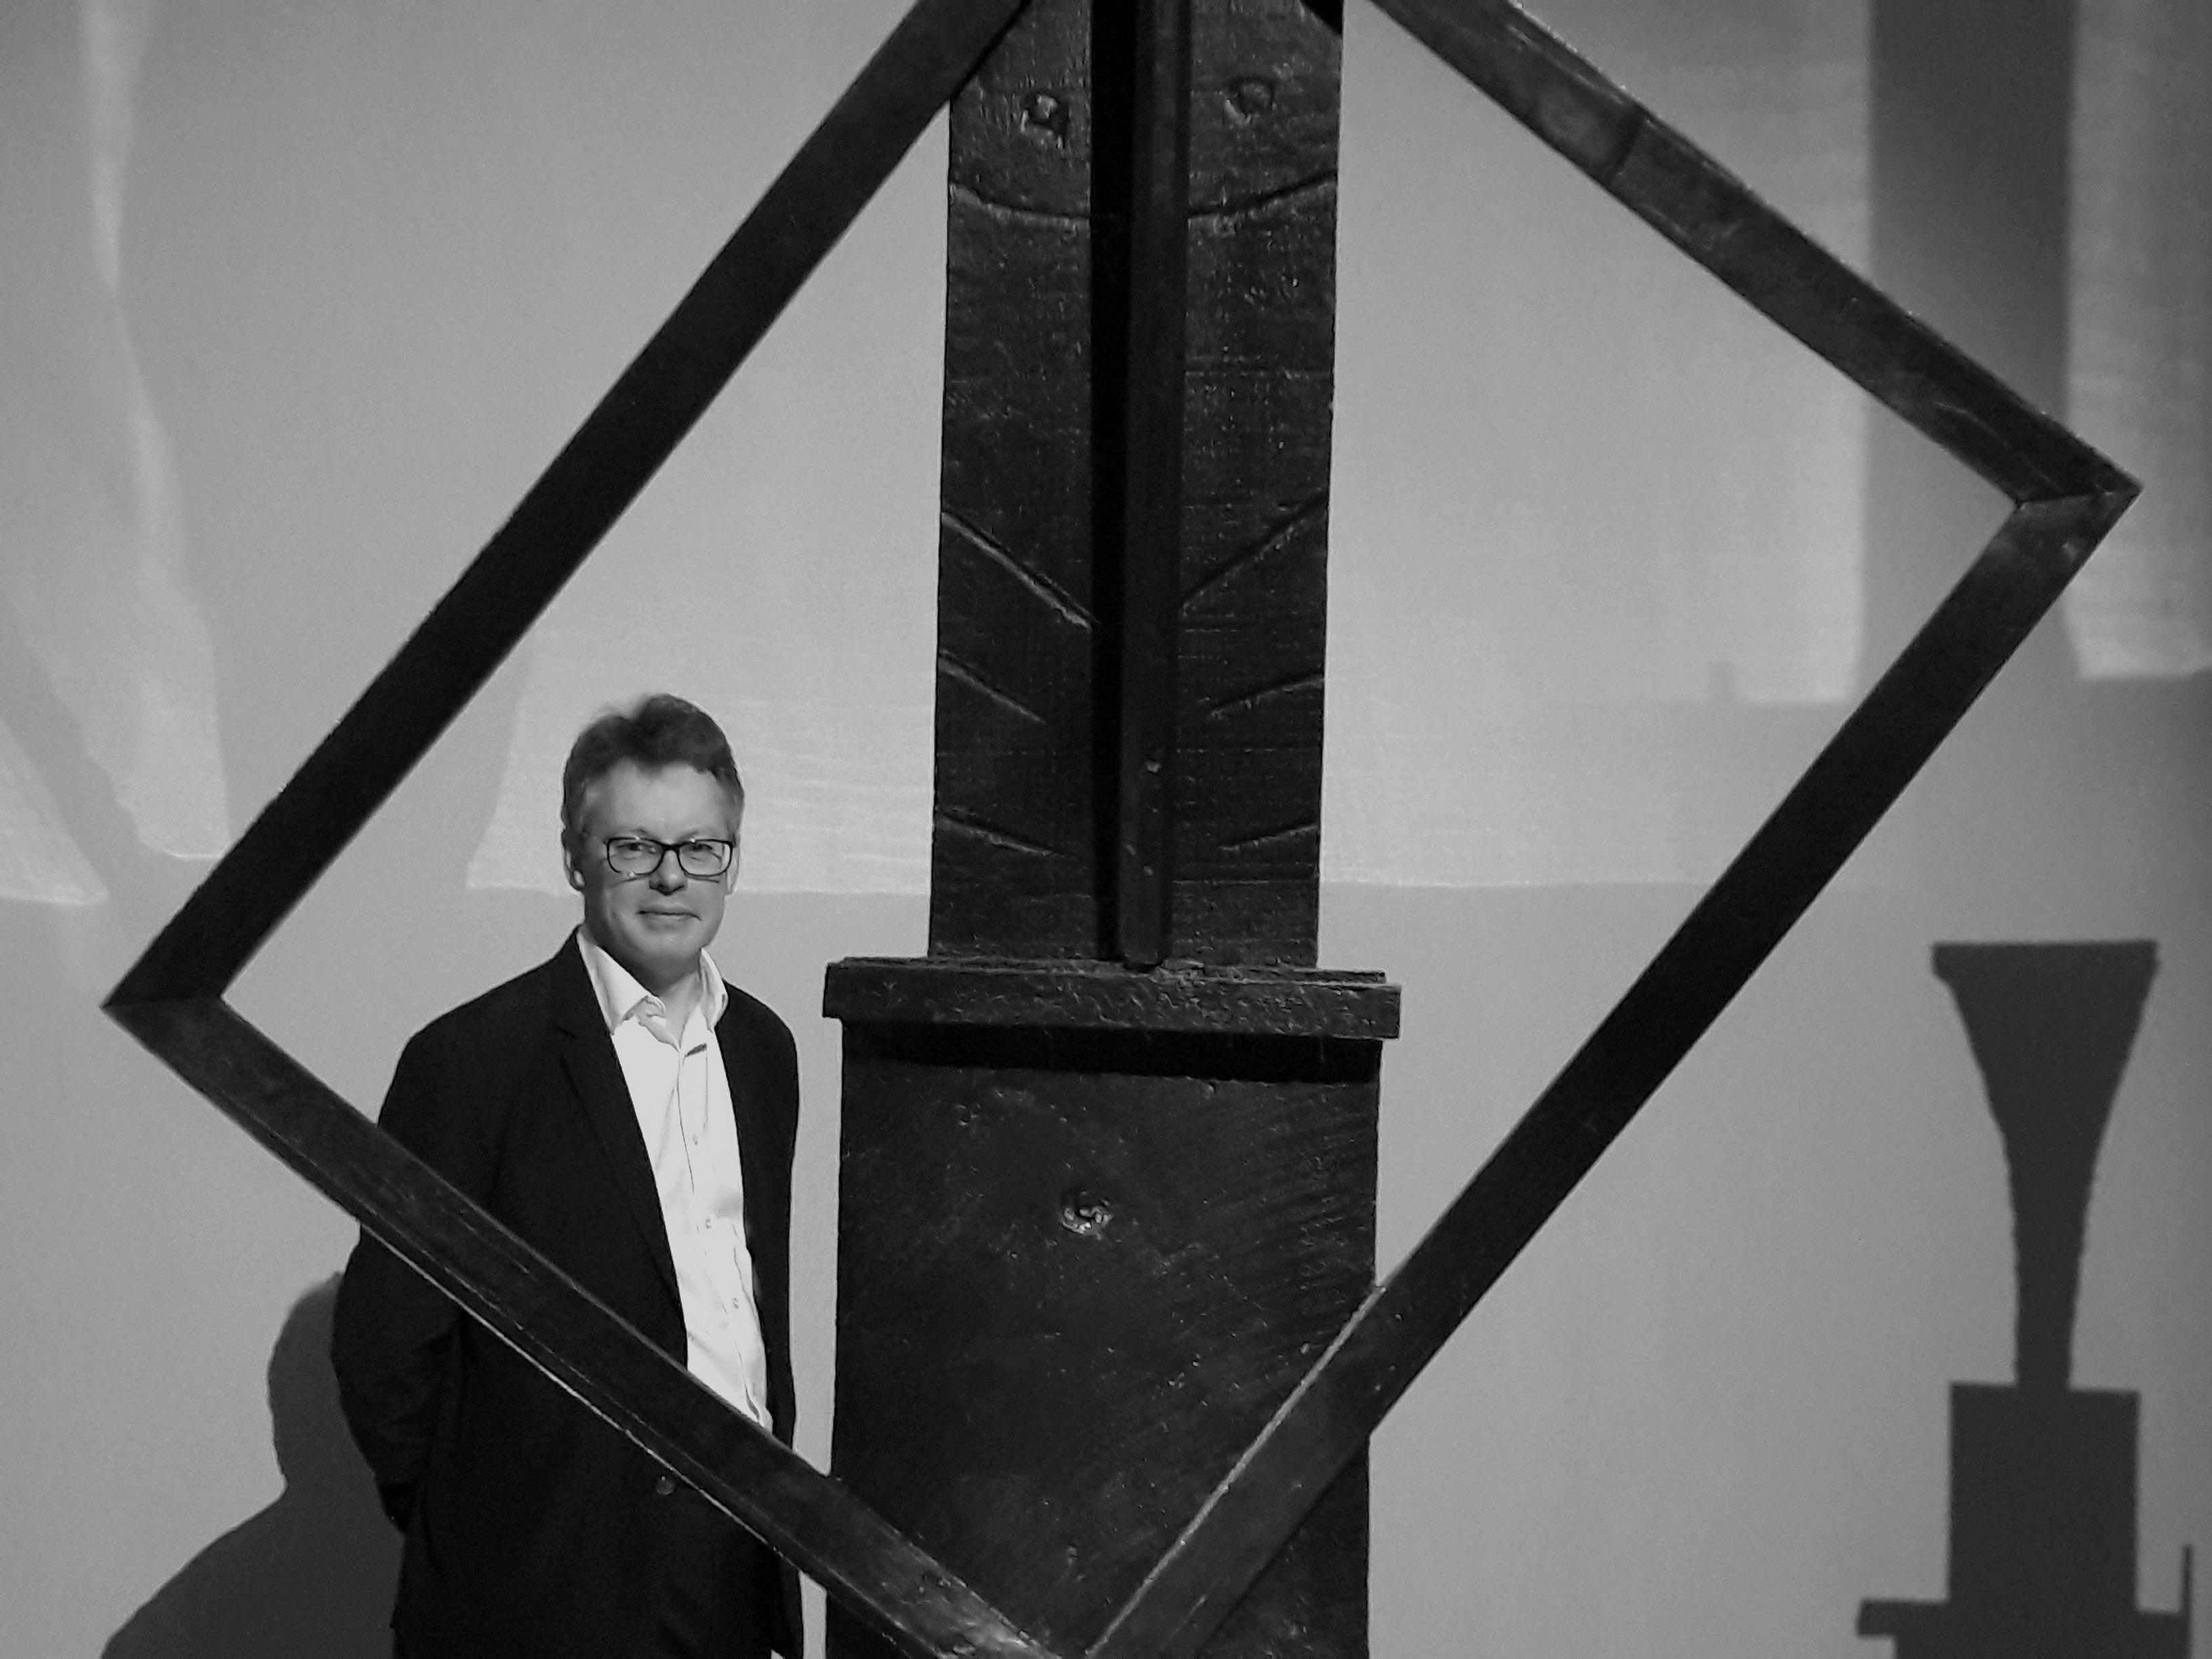 Dermot Turing - artistic pose